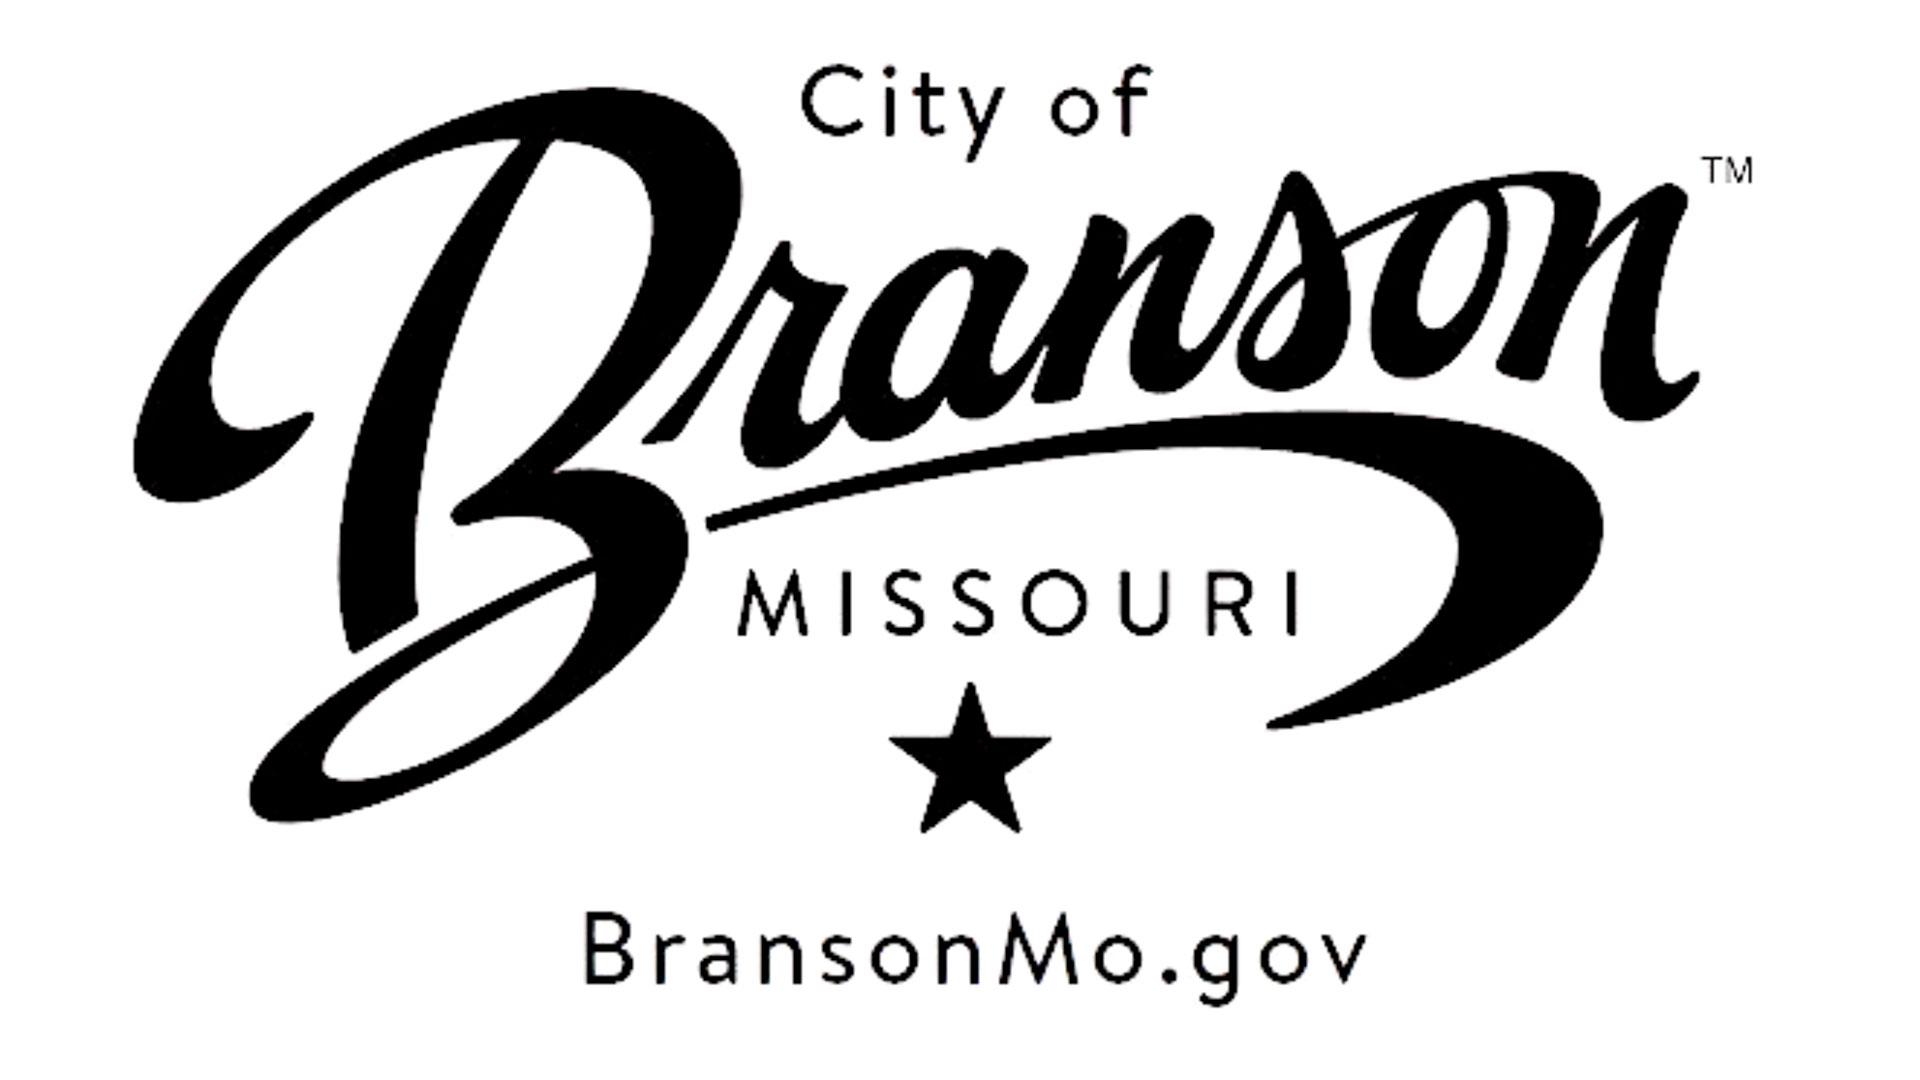 190308 Logo City Bransonjpg - Spring Forward – CDT - Change your Batteries This Weekend!